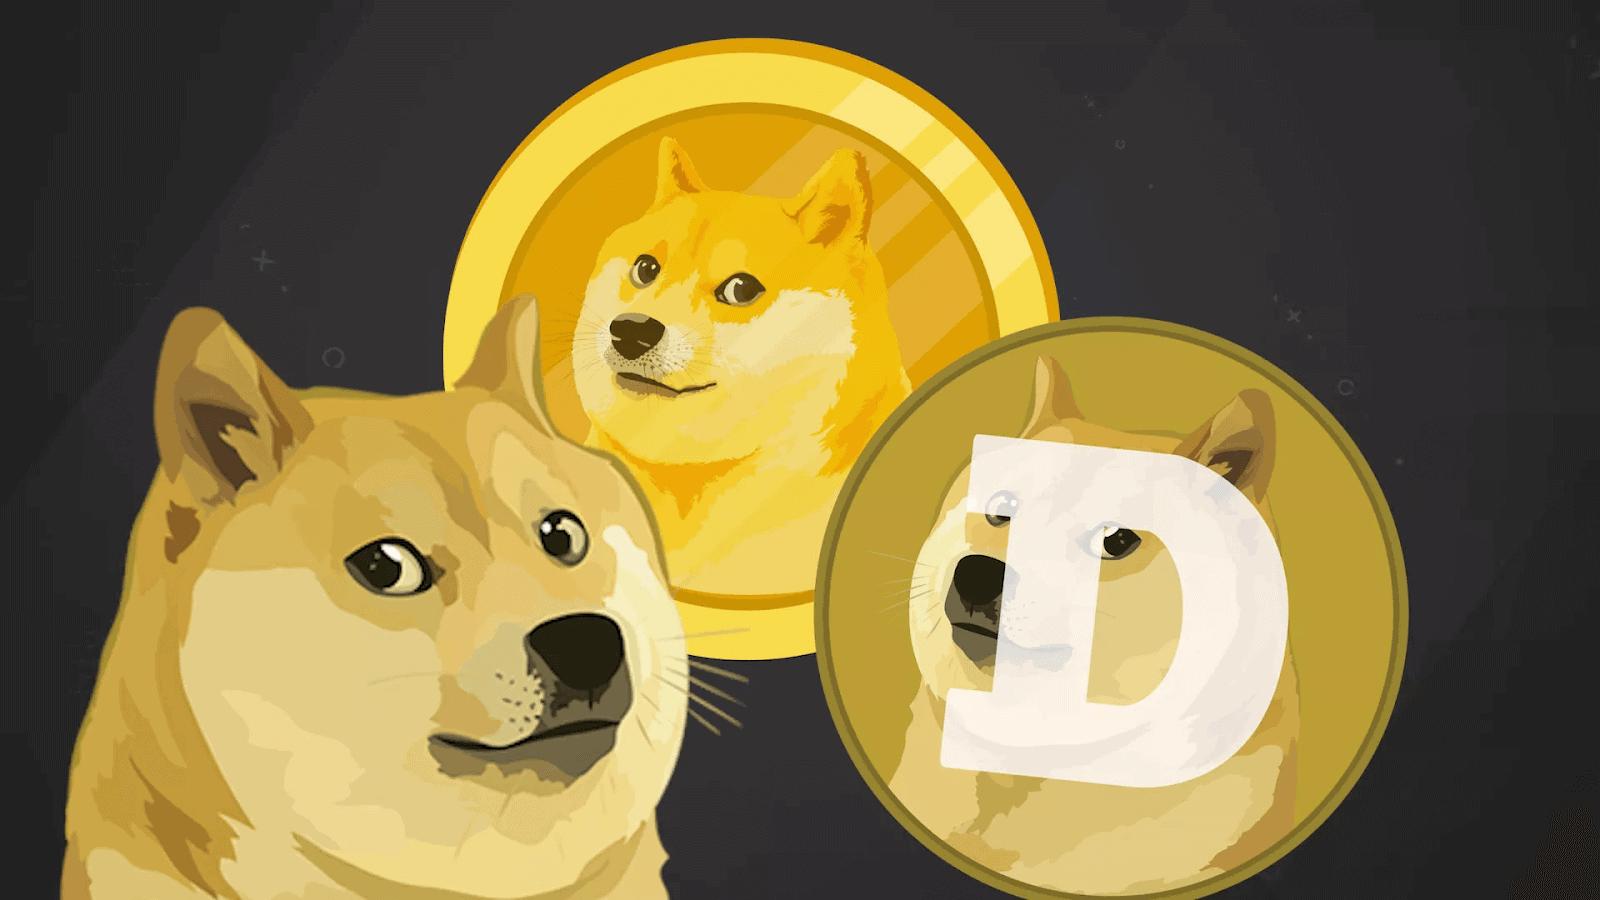 buy dogecoin uk